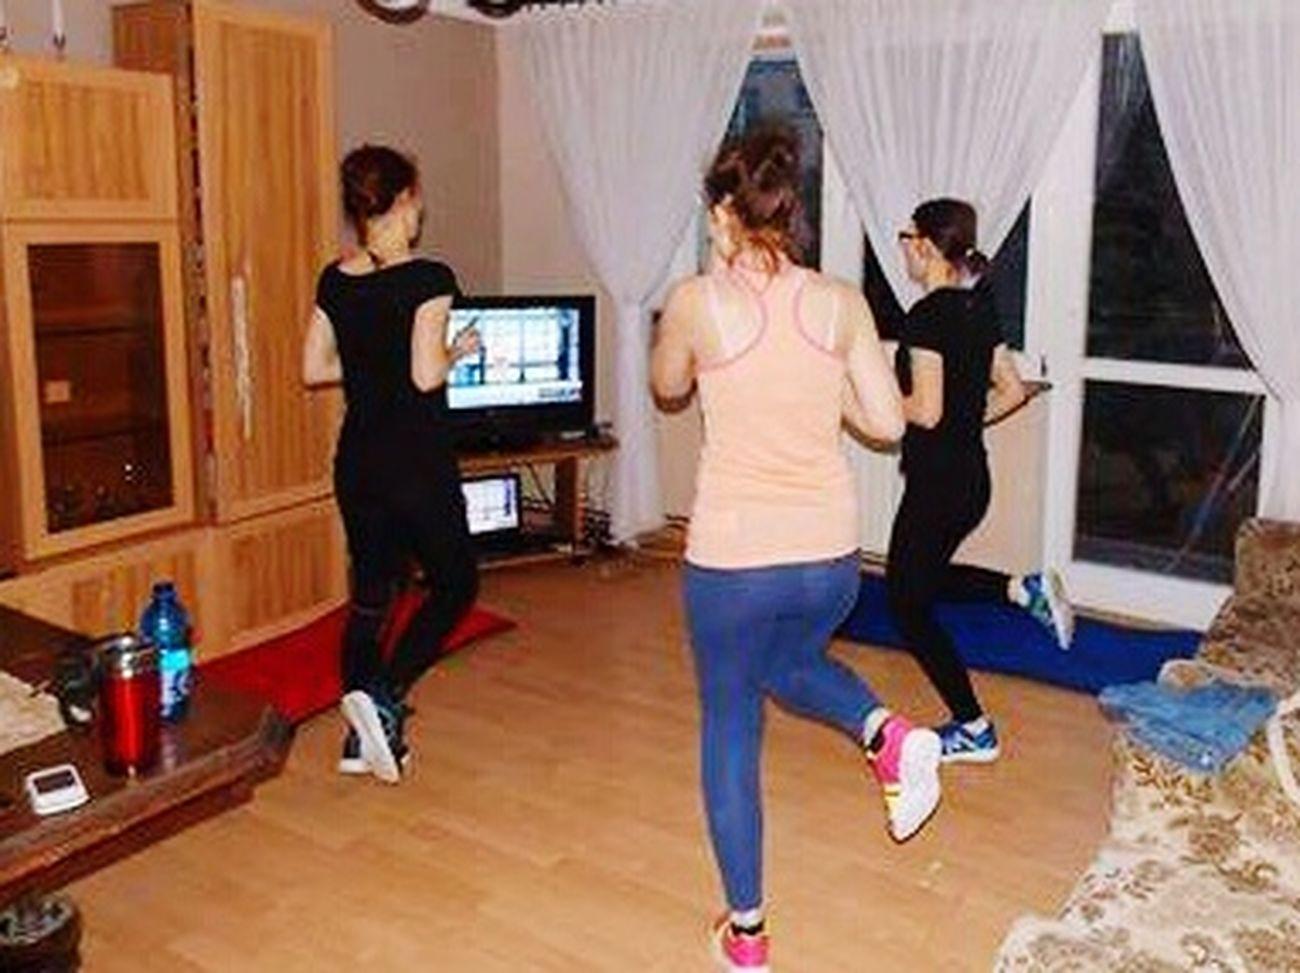 Hardworkout NoPain NoGain Ewa Chodakowska <3 Killer Sisters ❤ Good Times♥